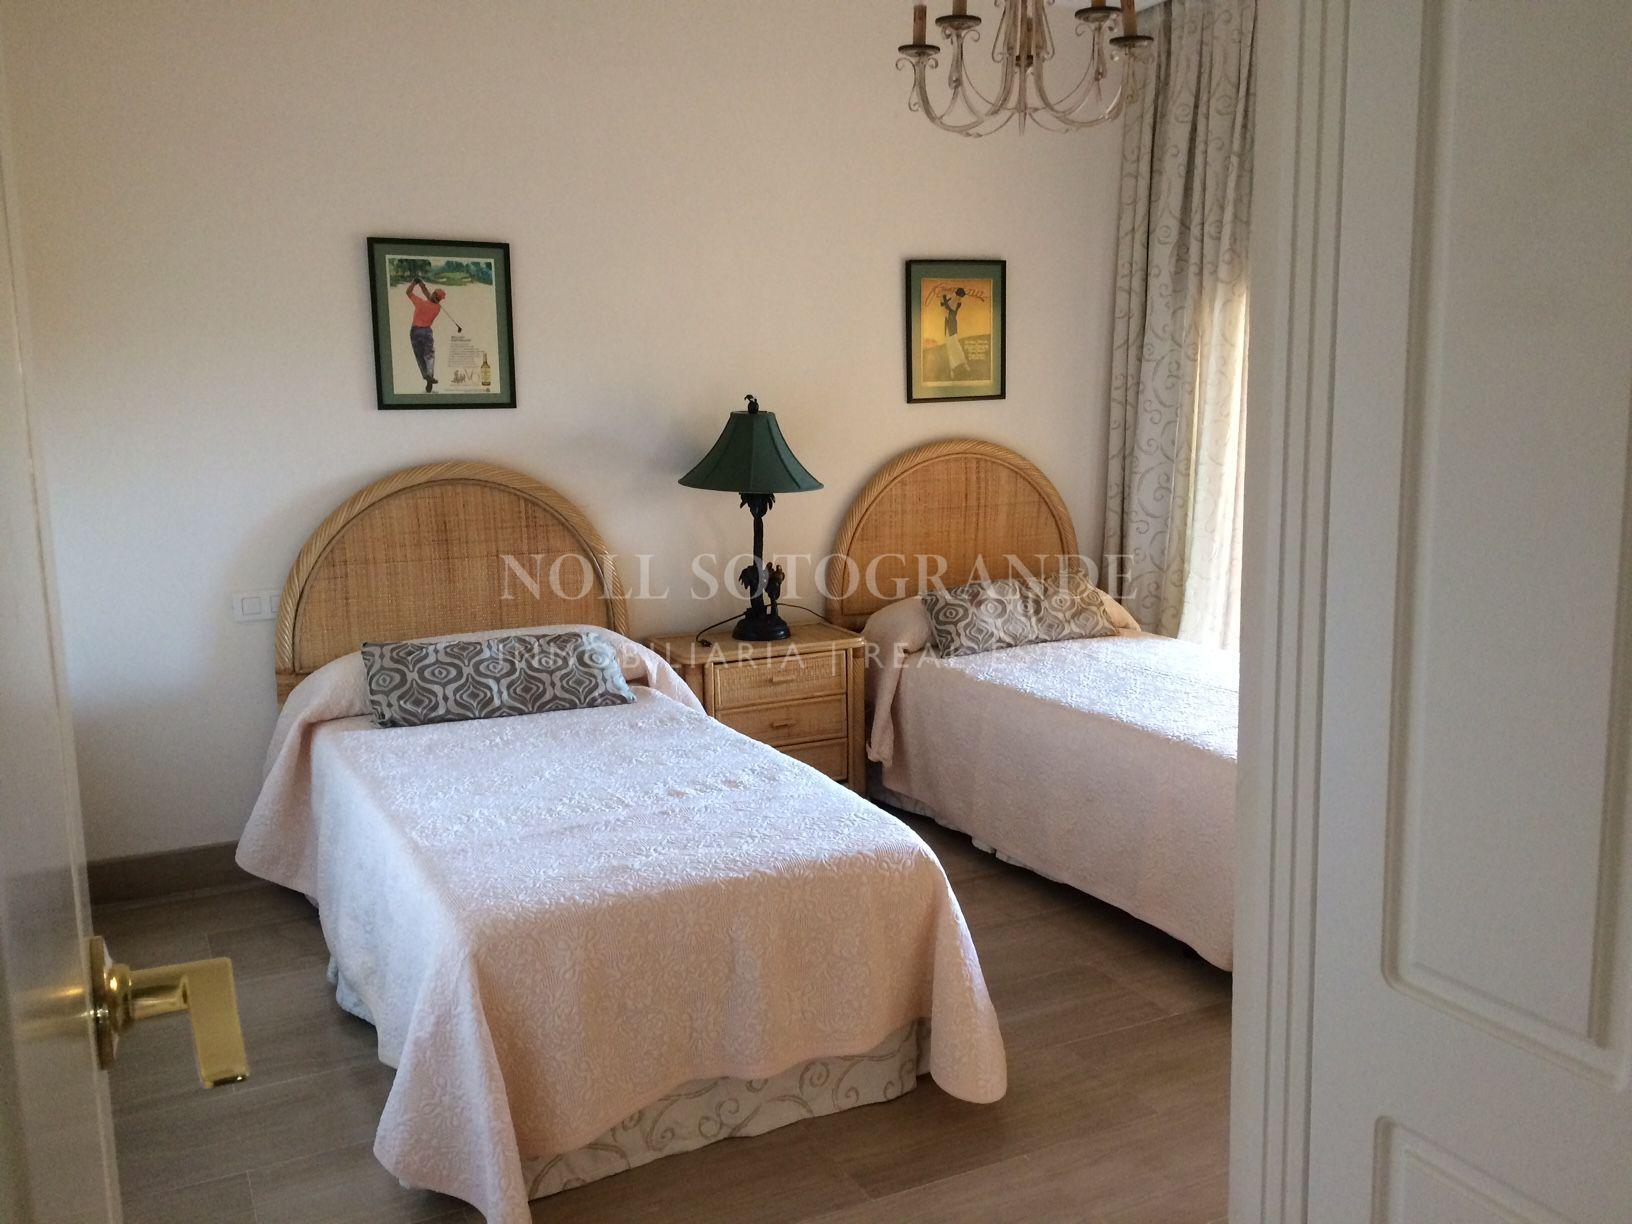 Apartment for rent in Los Gazules de Almenara, Sotogrande